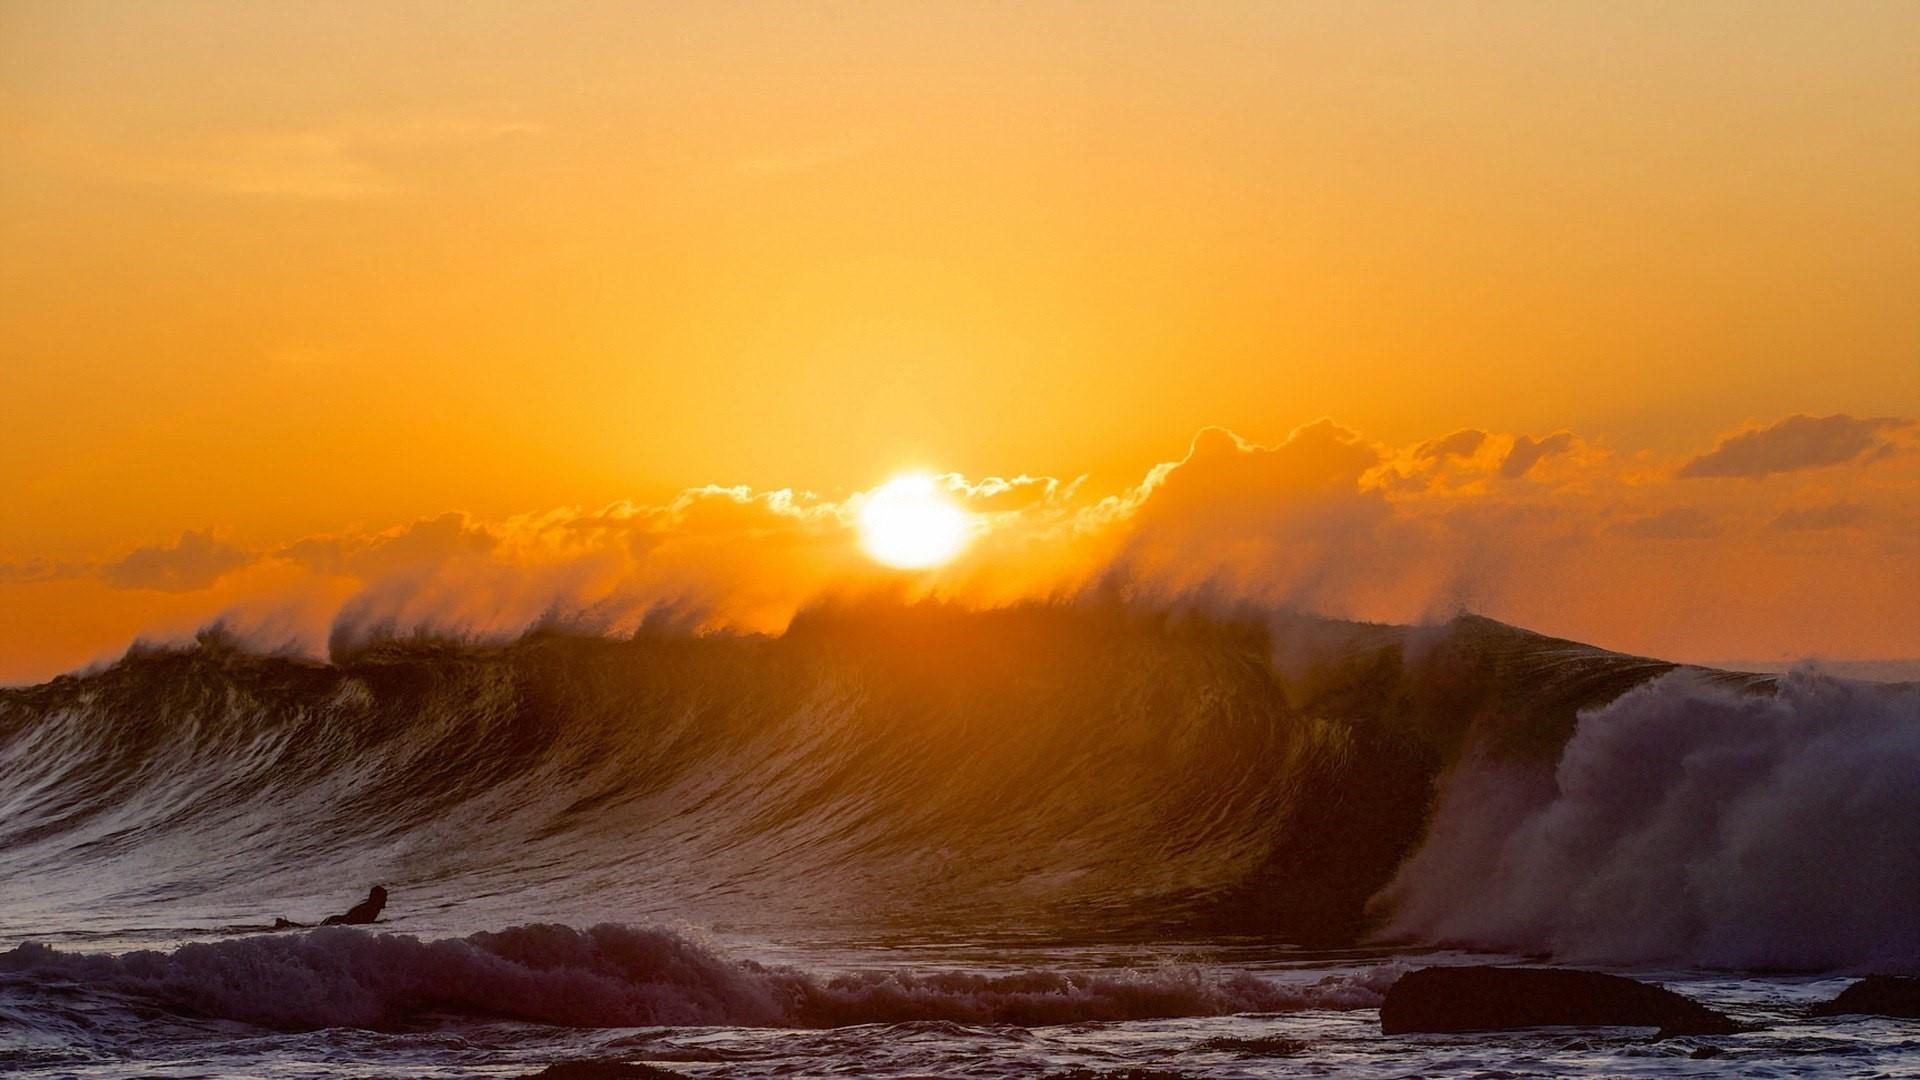 Surfer in the sunset wallpaper